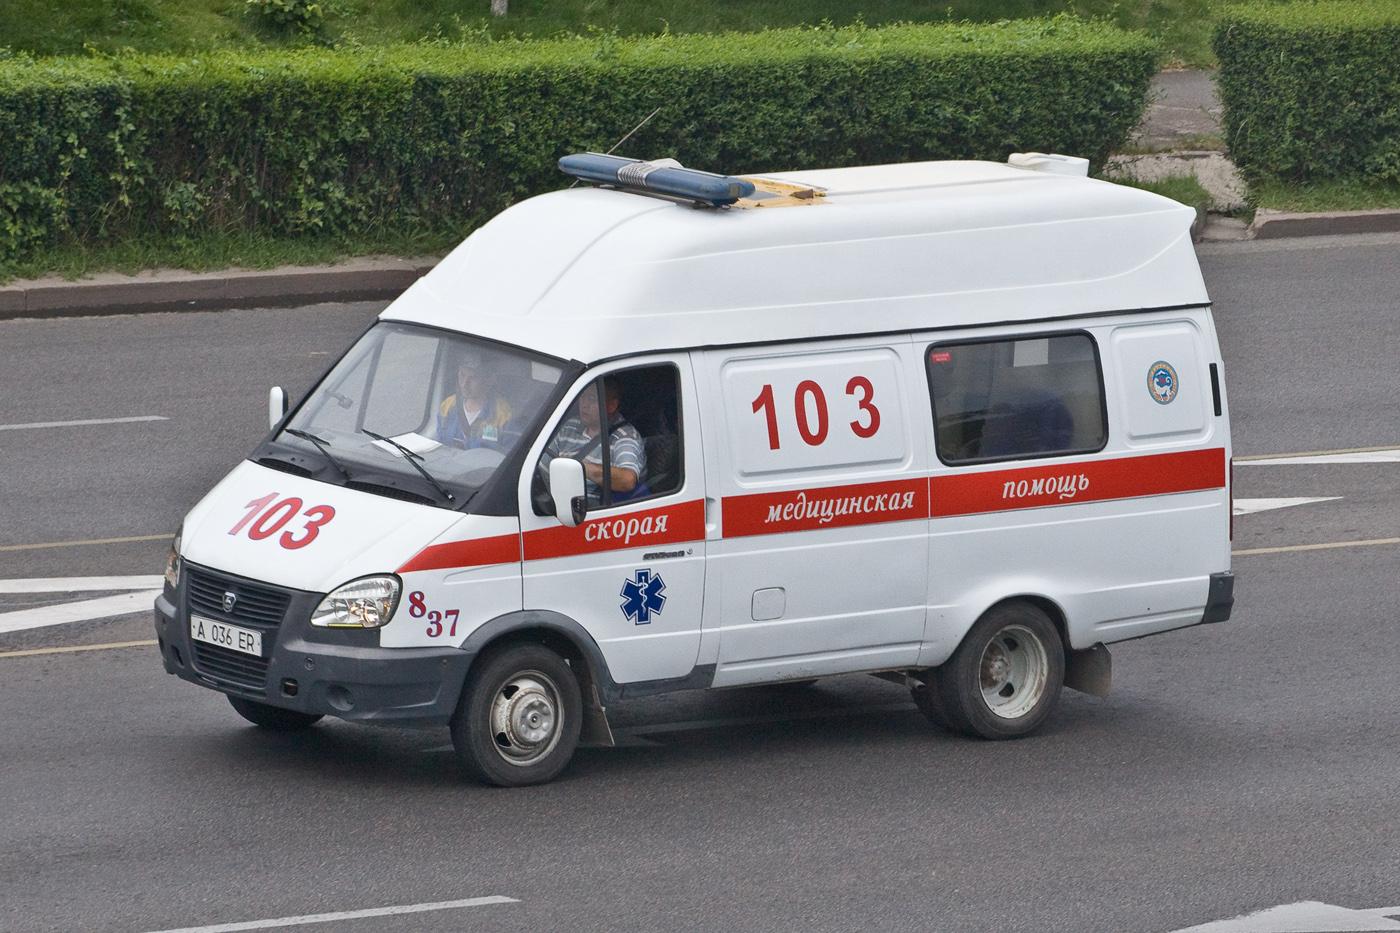 Родственник пациента напал на медсестру скорой помощи